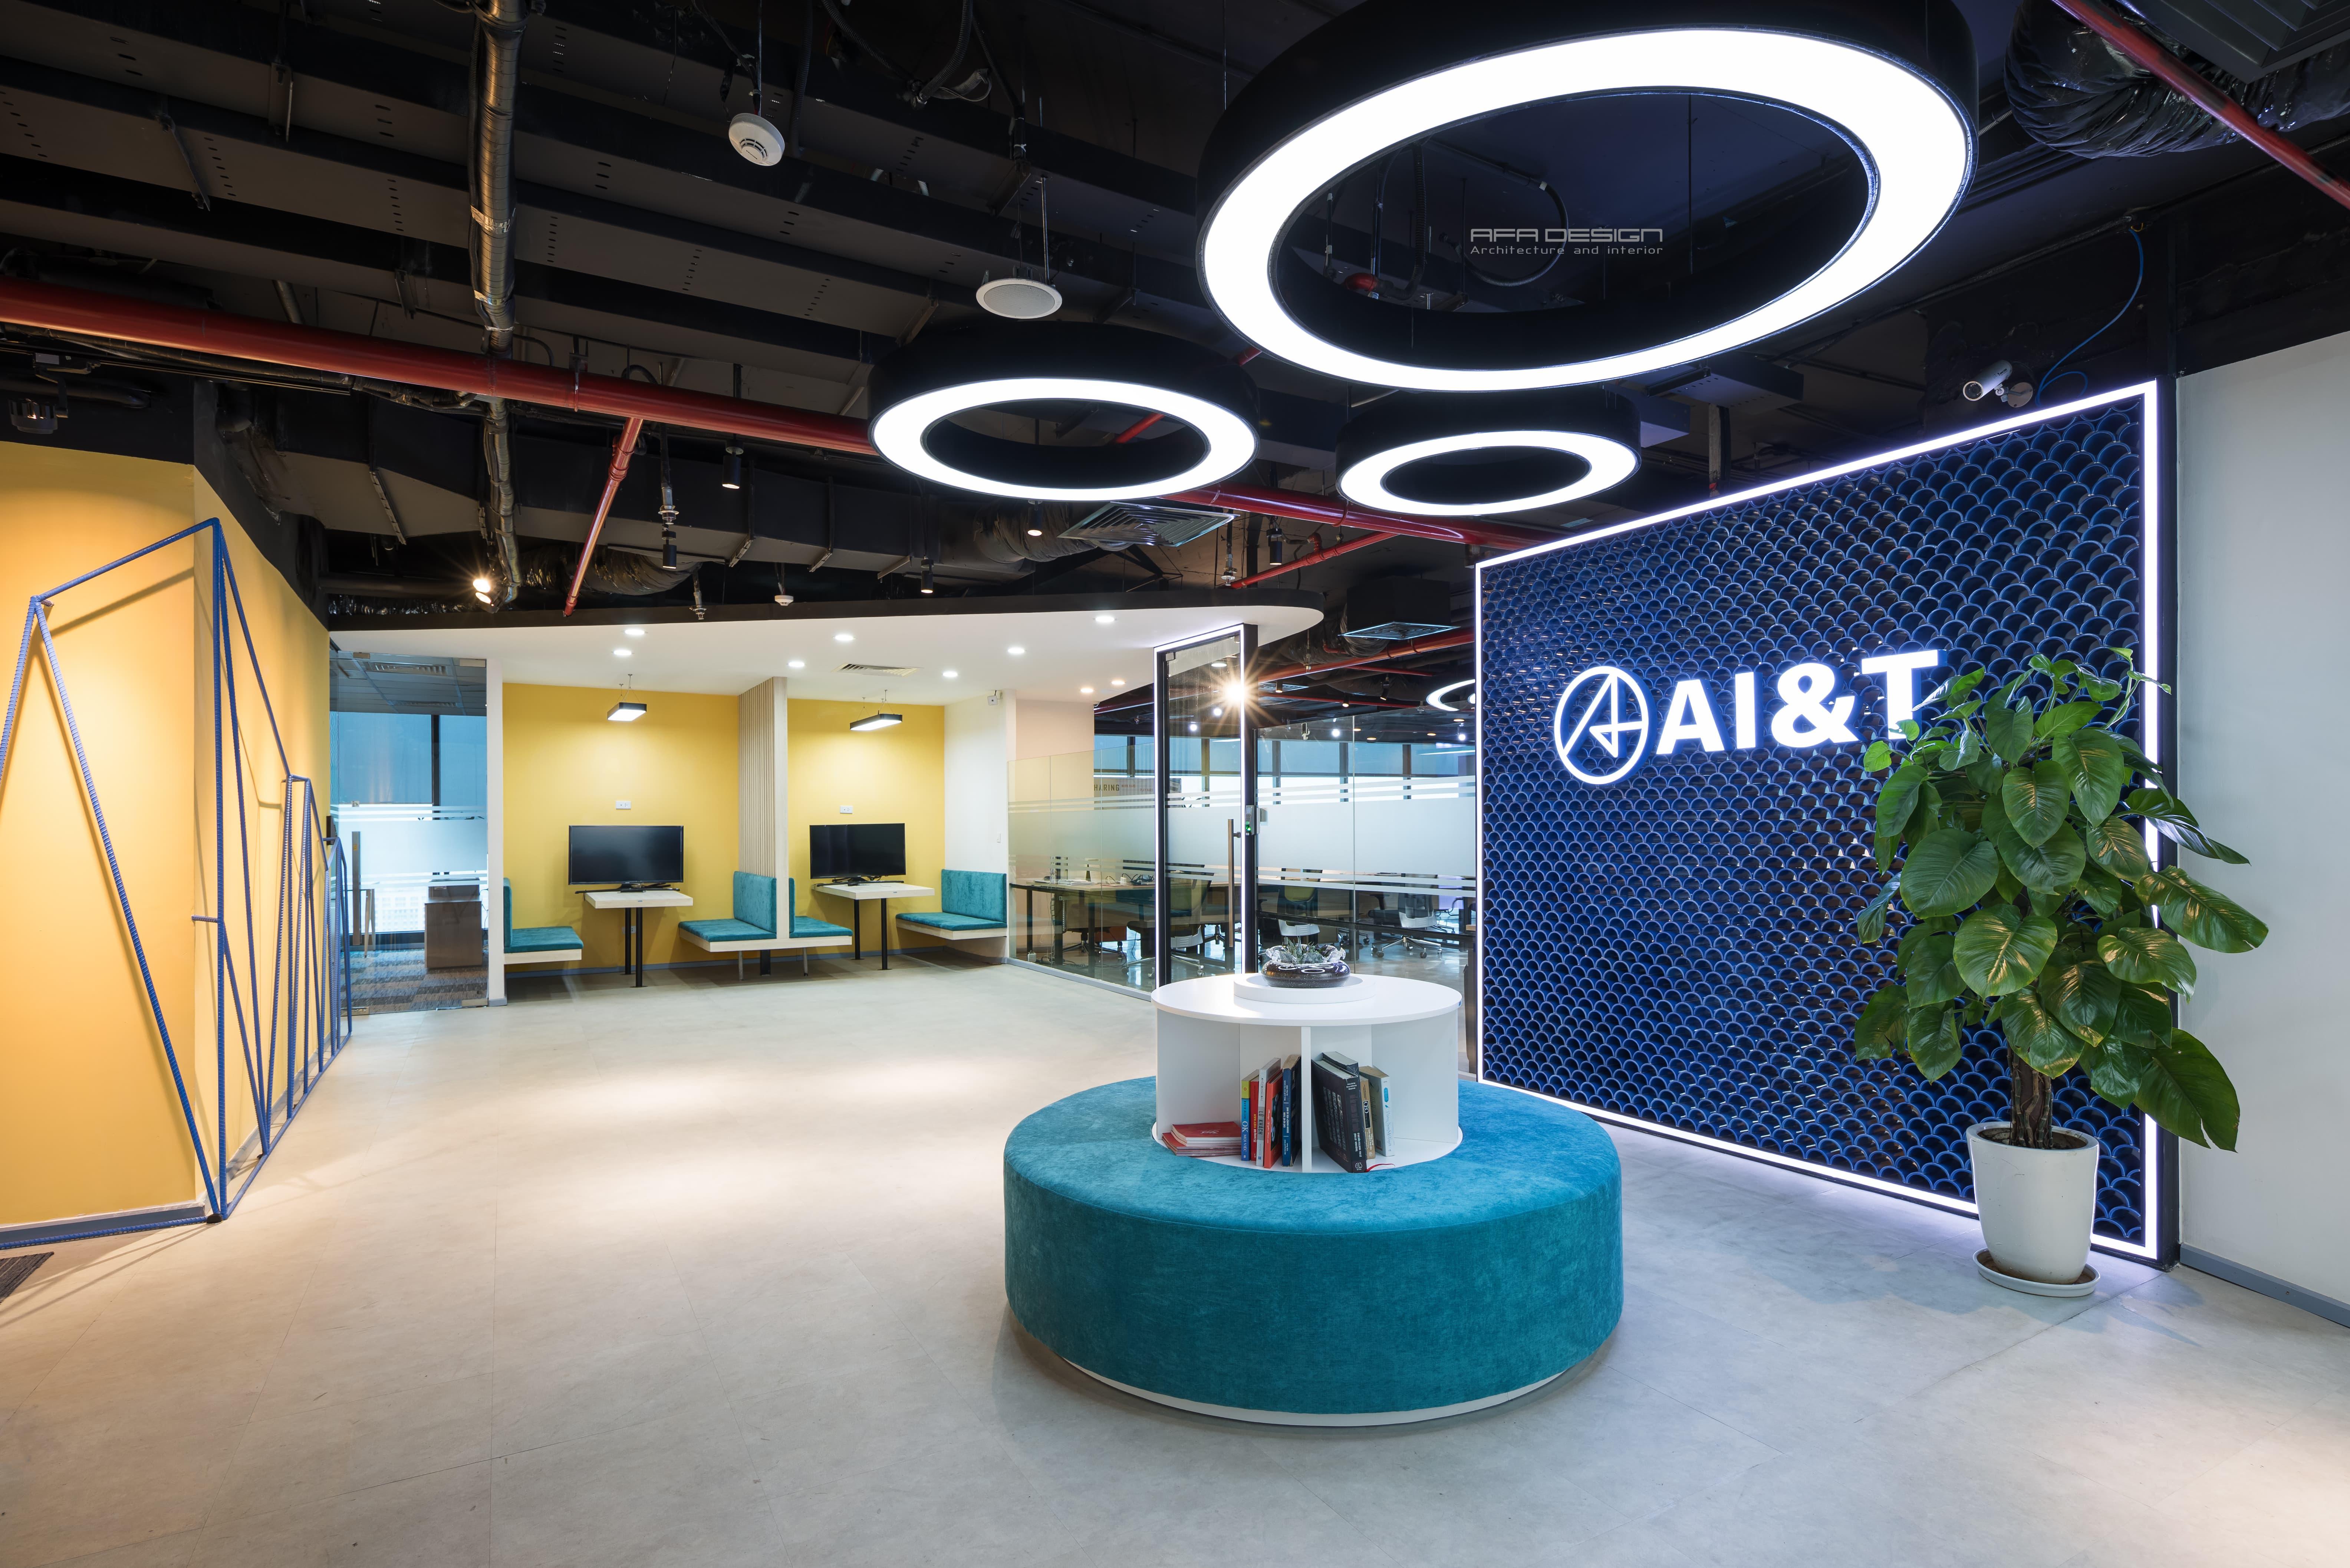 AI&T TECHNOLOGY COMPANY OFFICE